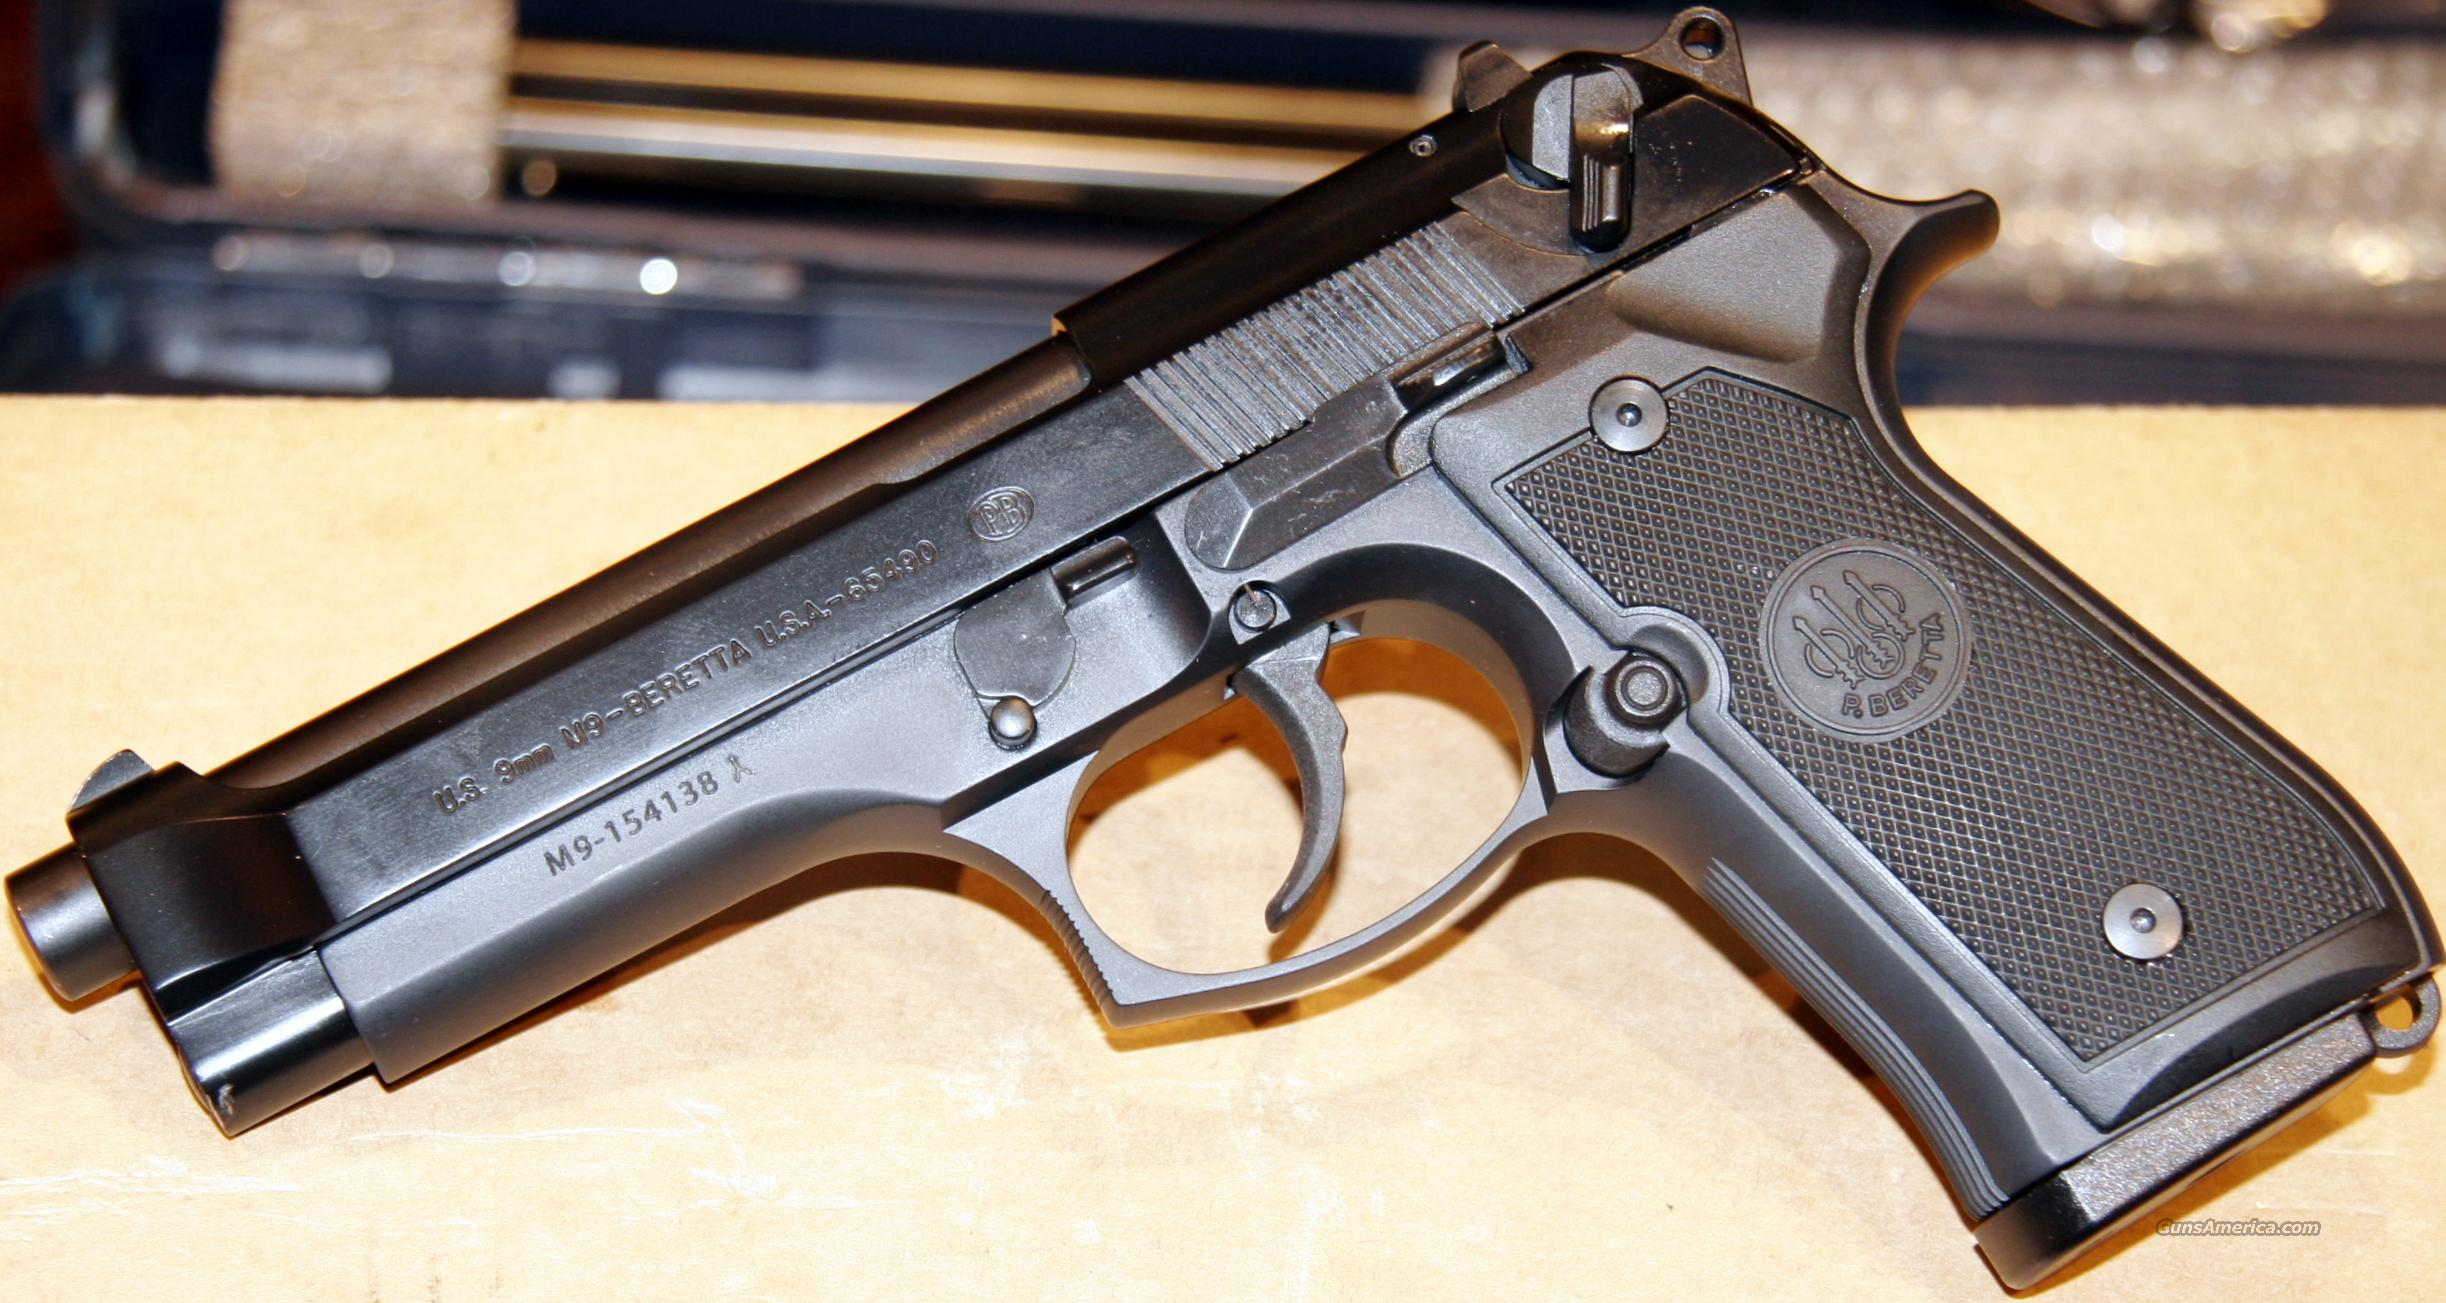 Beretta M9 9mm Pistol for sale